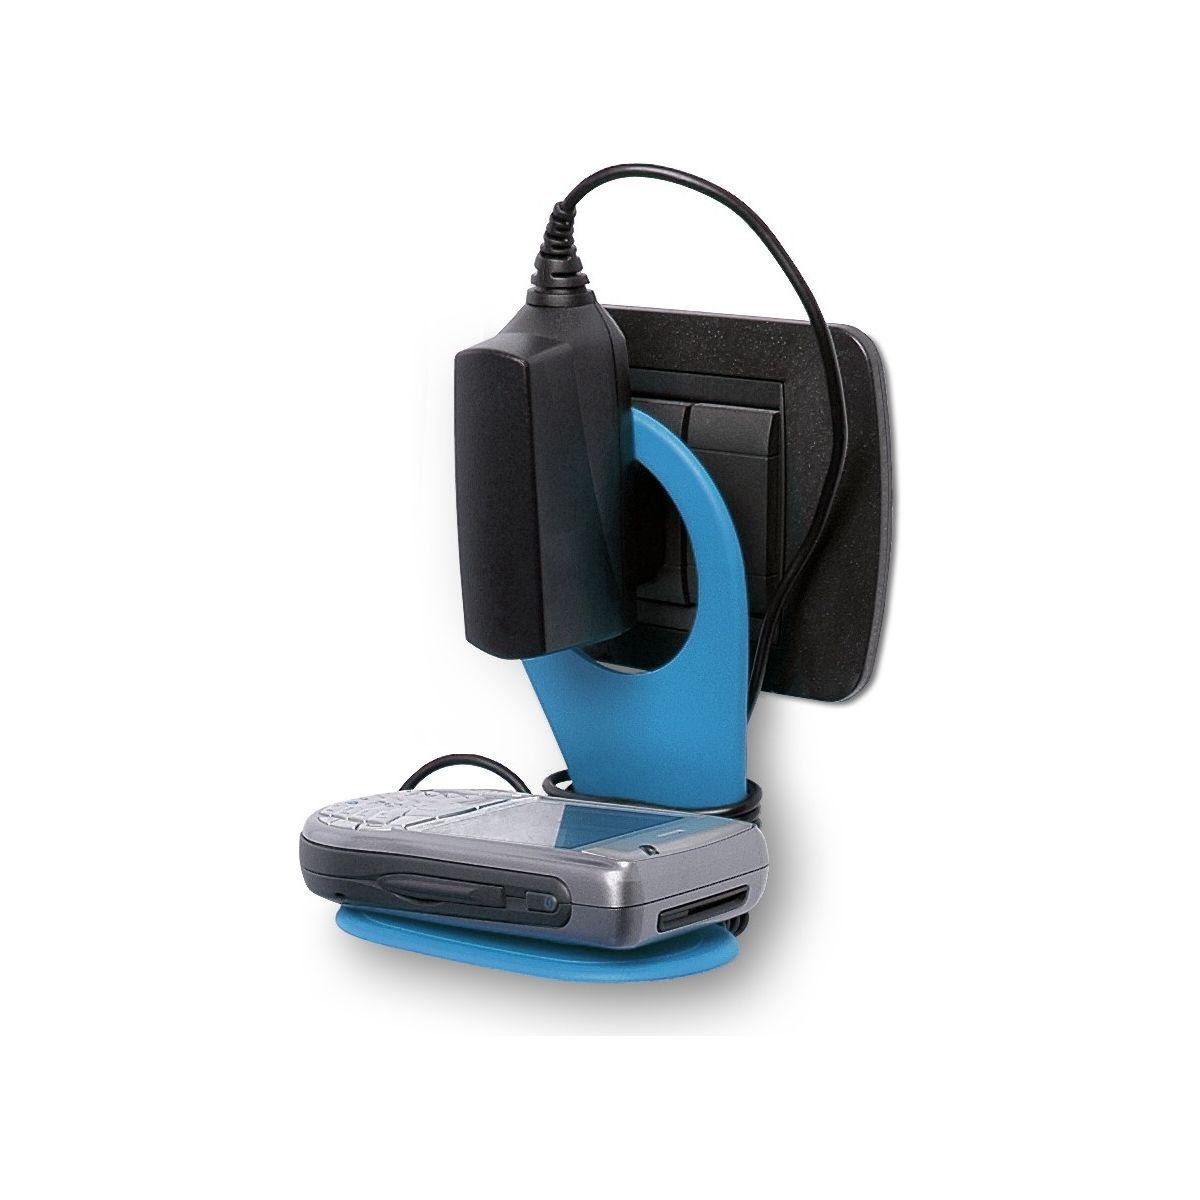 Support driinn porte-portable xl pliable bleu (photo)